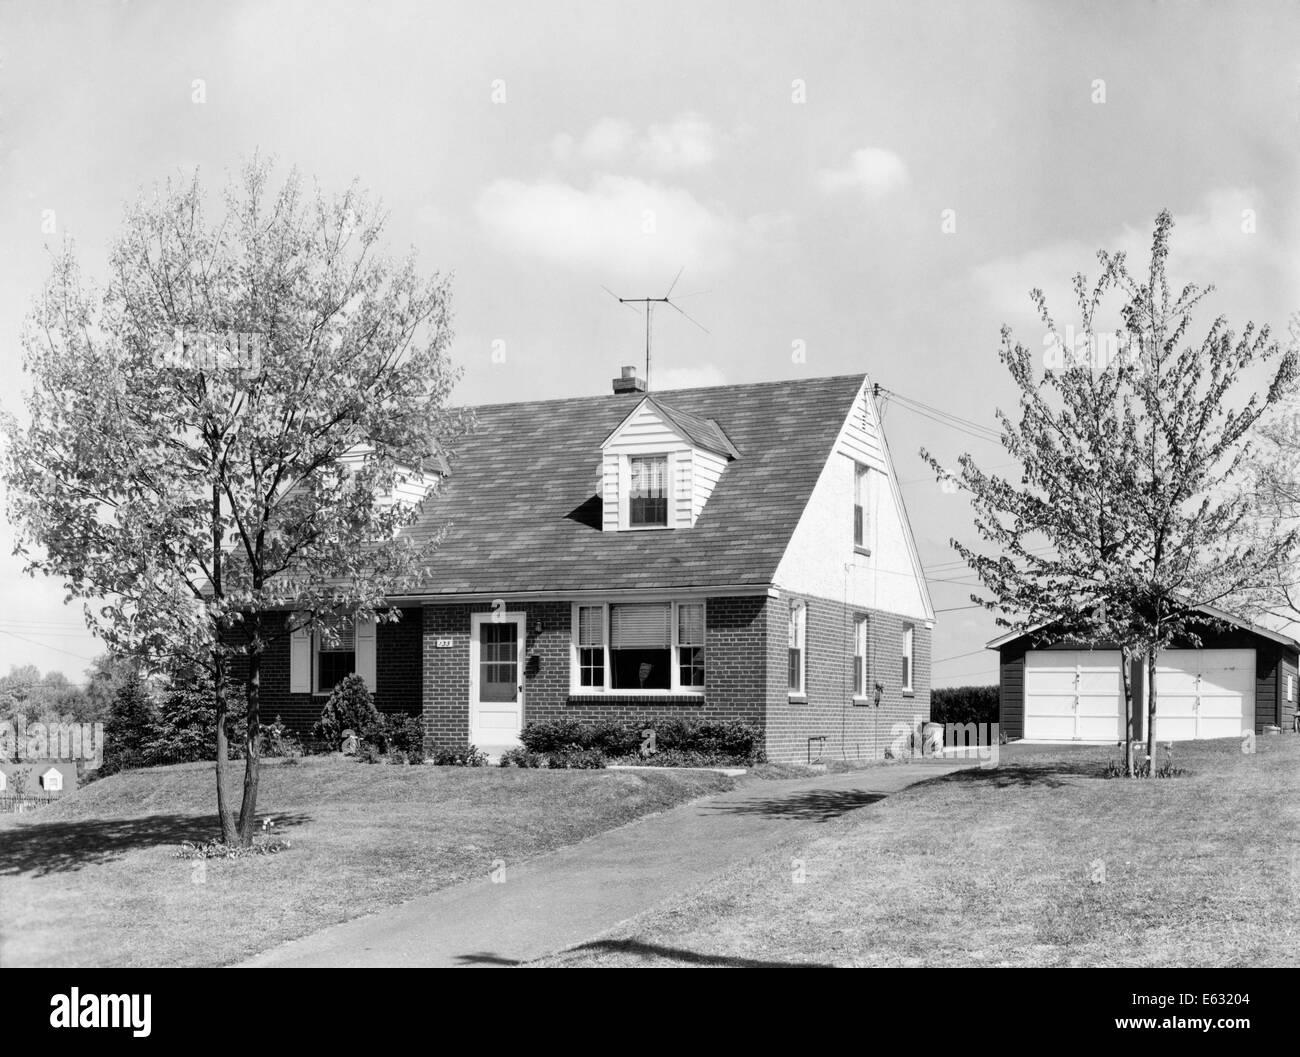 1950s BRICK TWO STORY SUBURBAN HOME SEPARATE 2 CAR GARAGE ...  1950s Suburban Homes